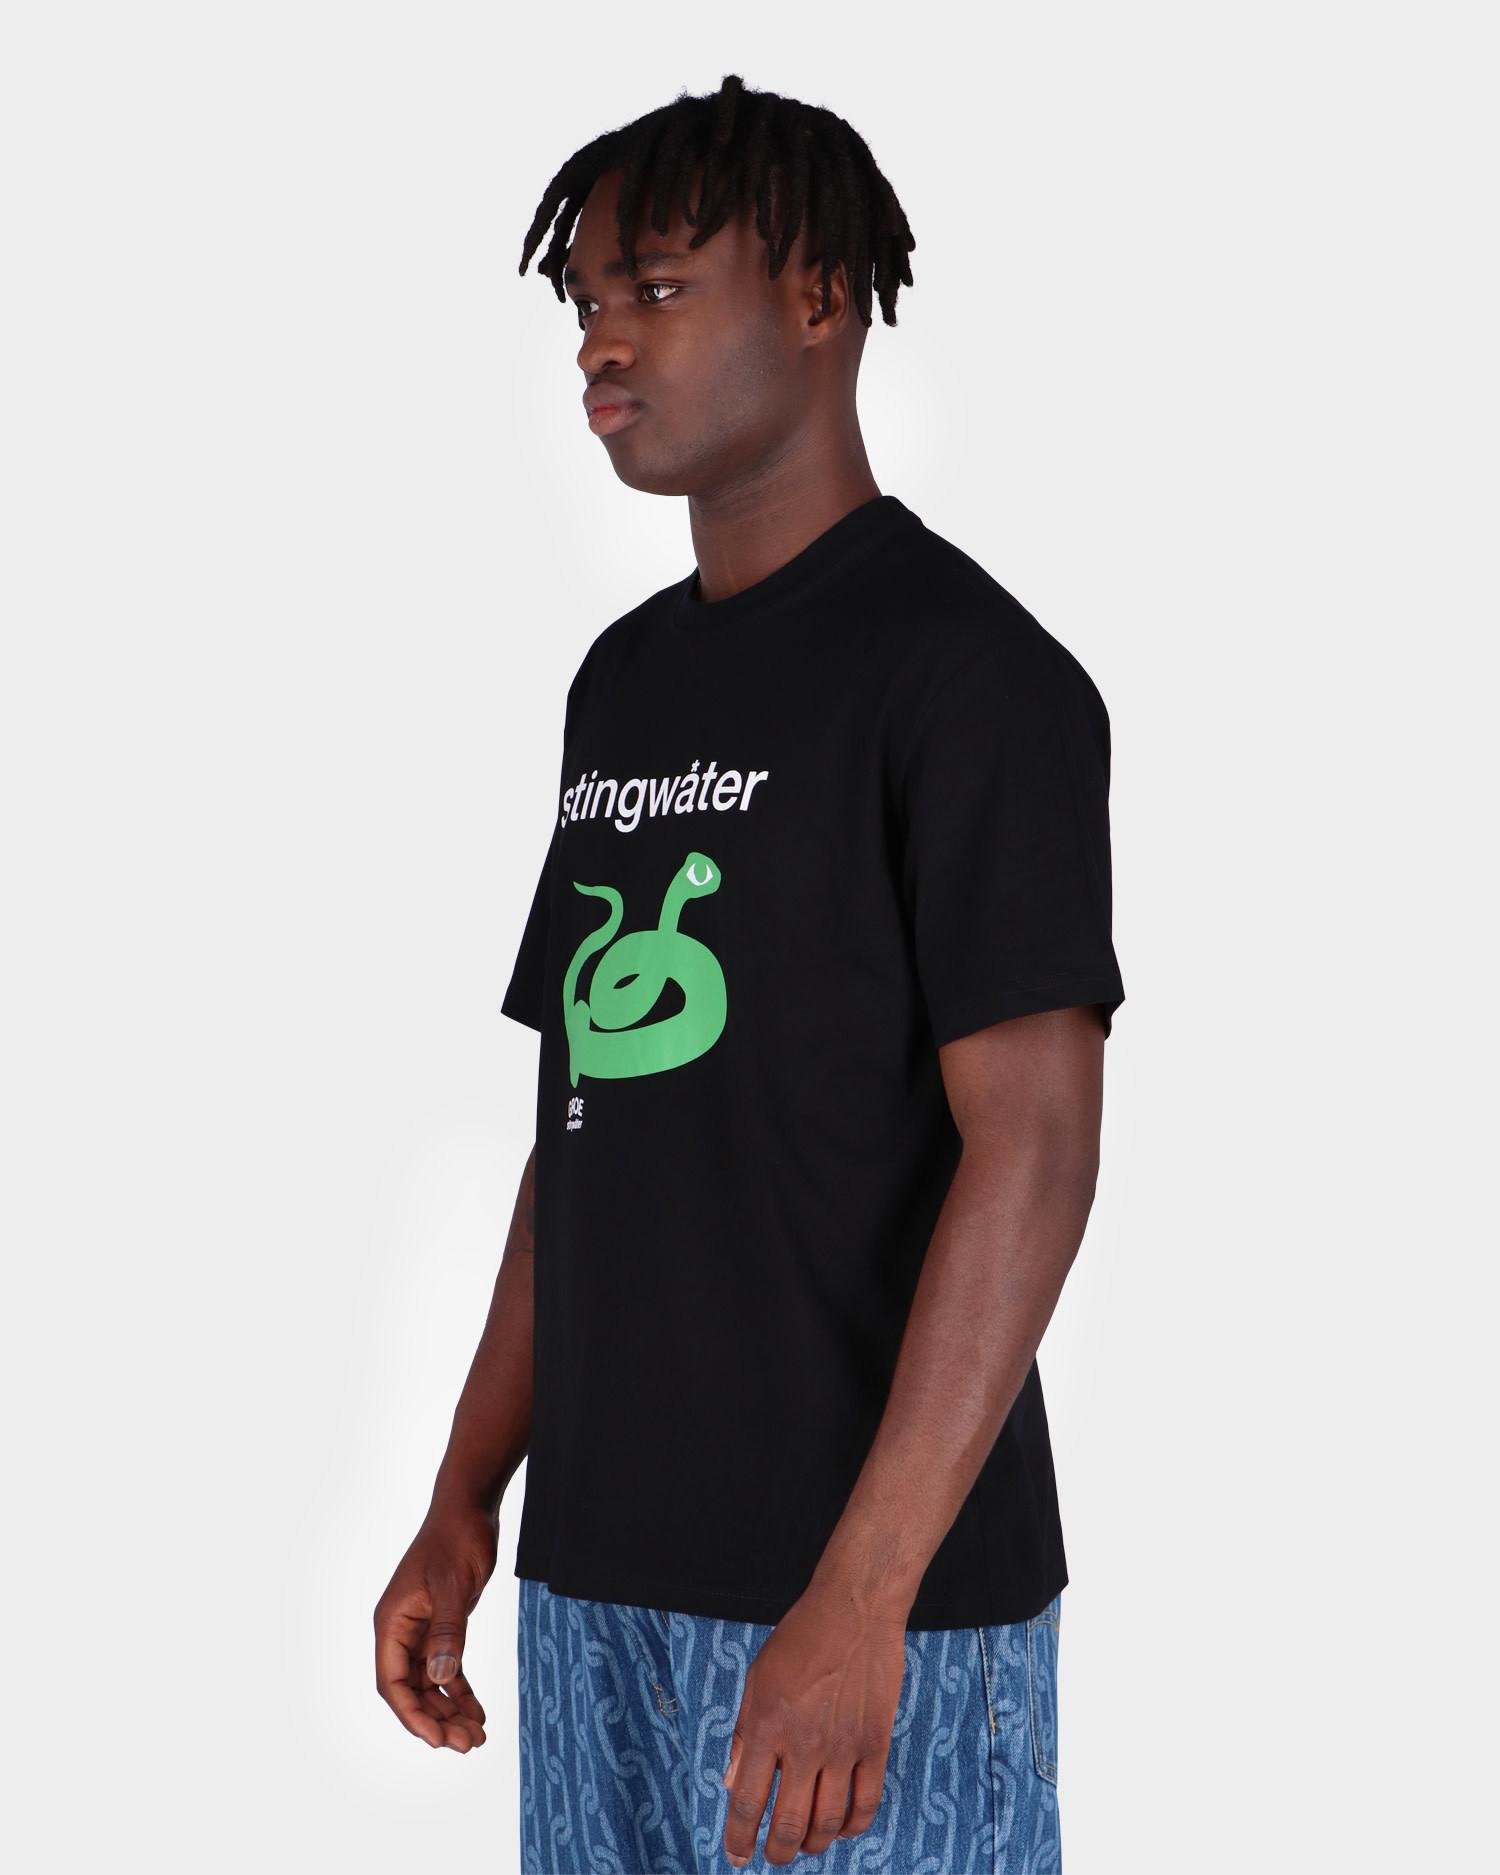 Stingwater Snake T-Shirt Black